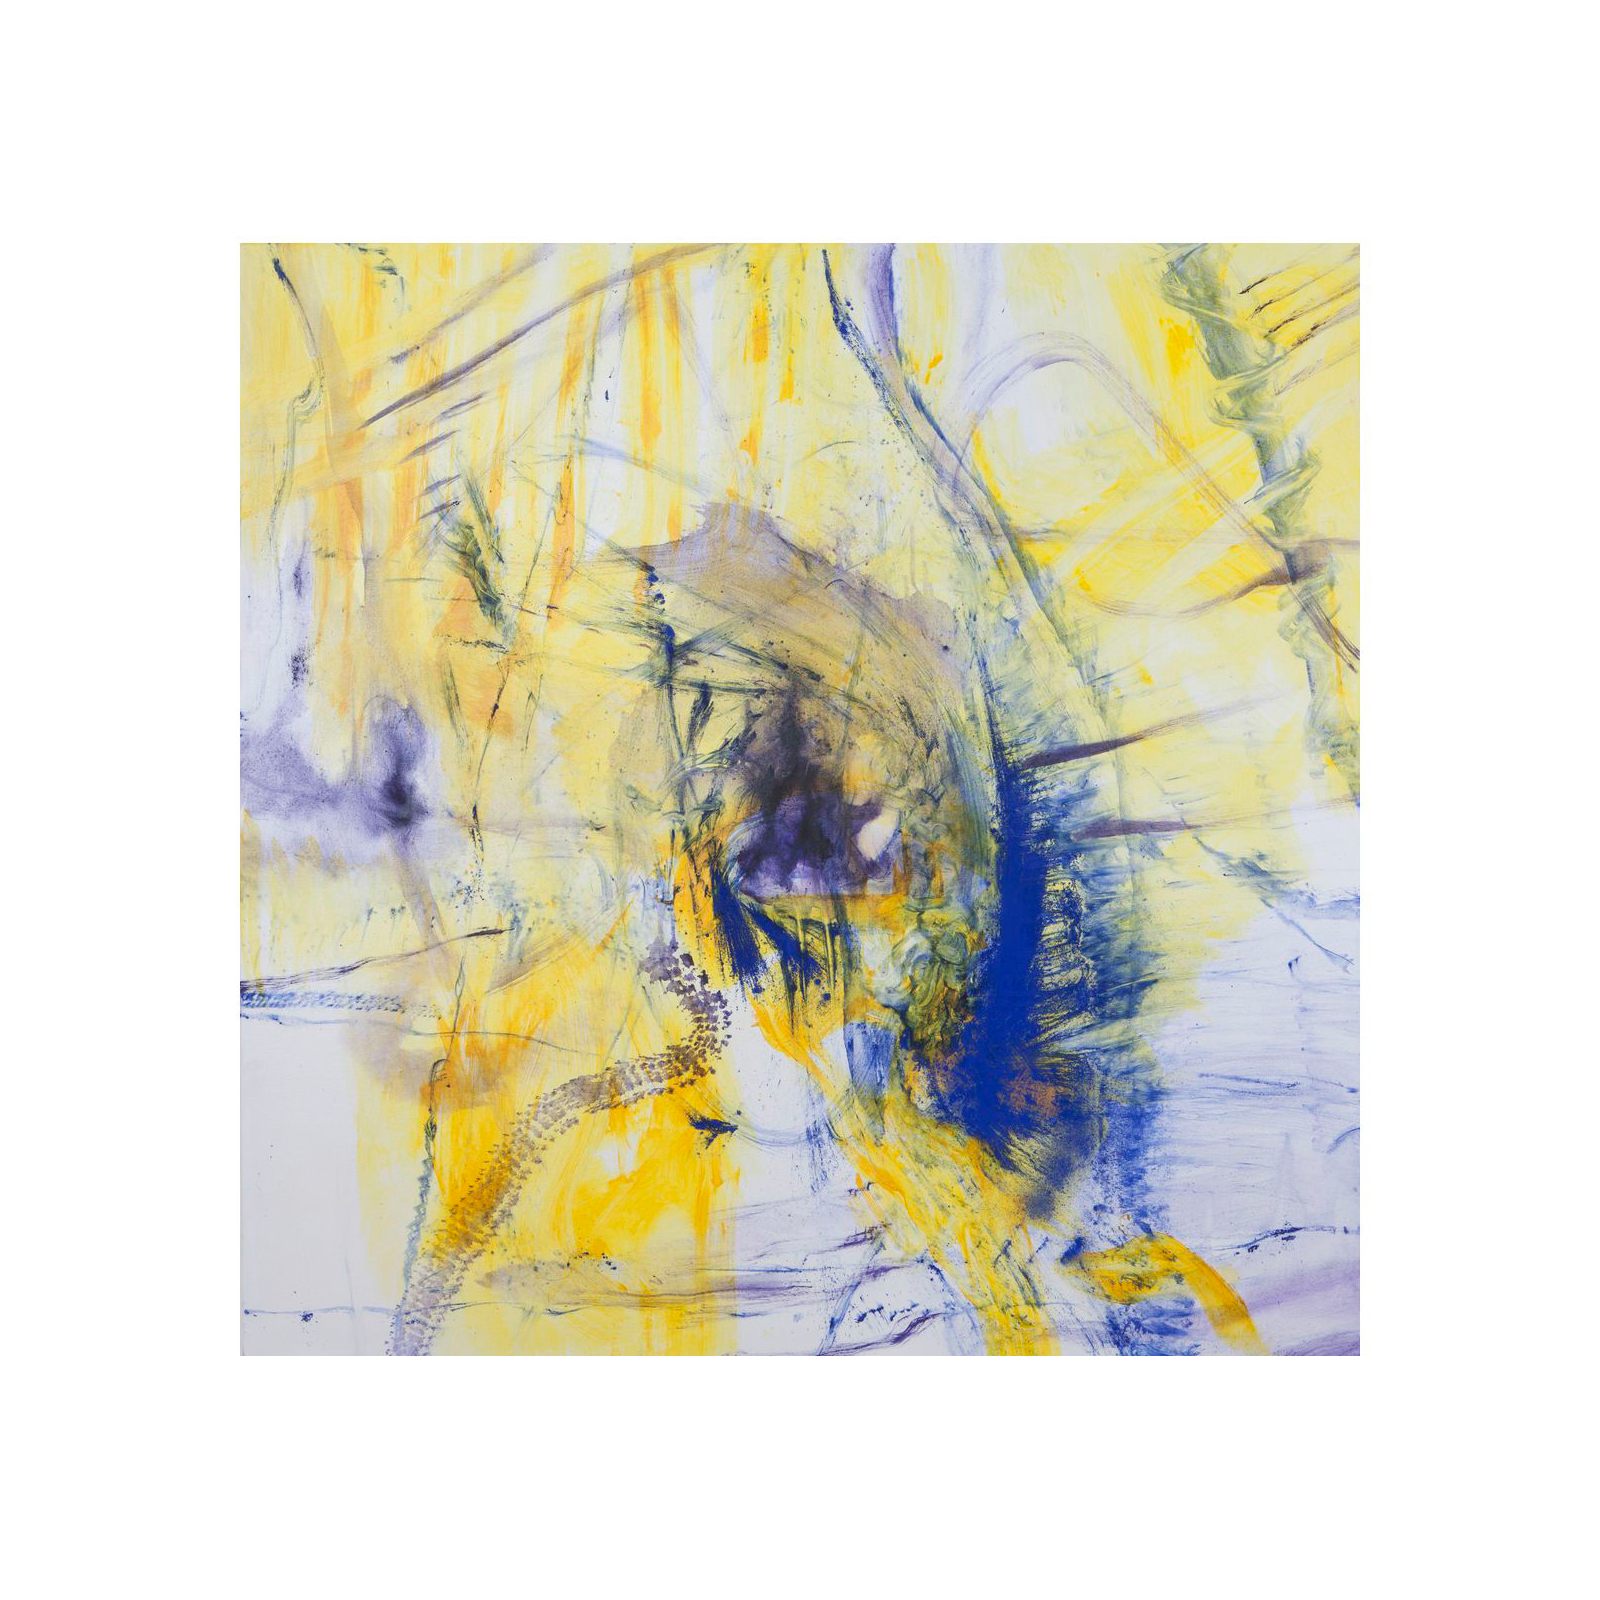 Peter Manhal – Künstler